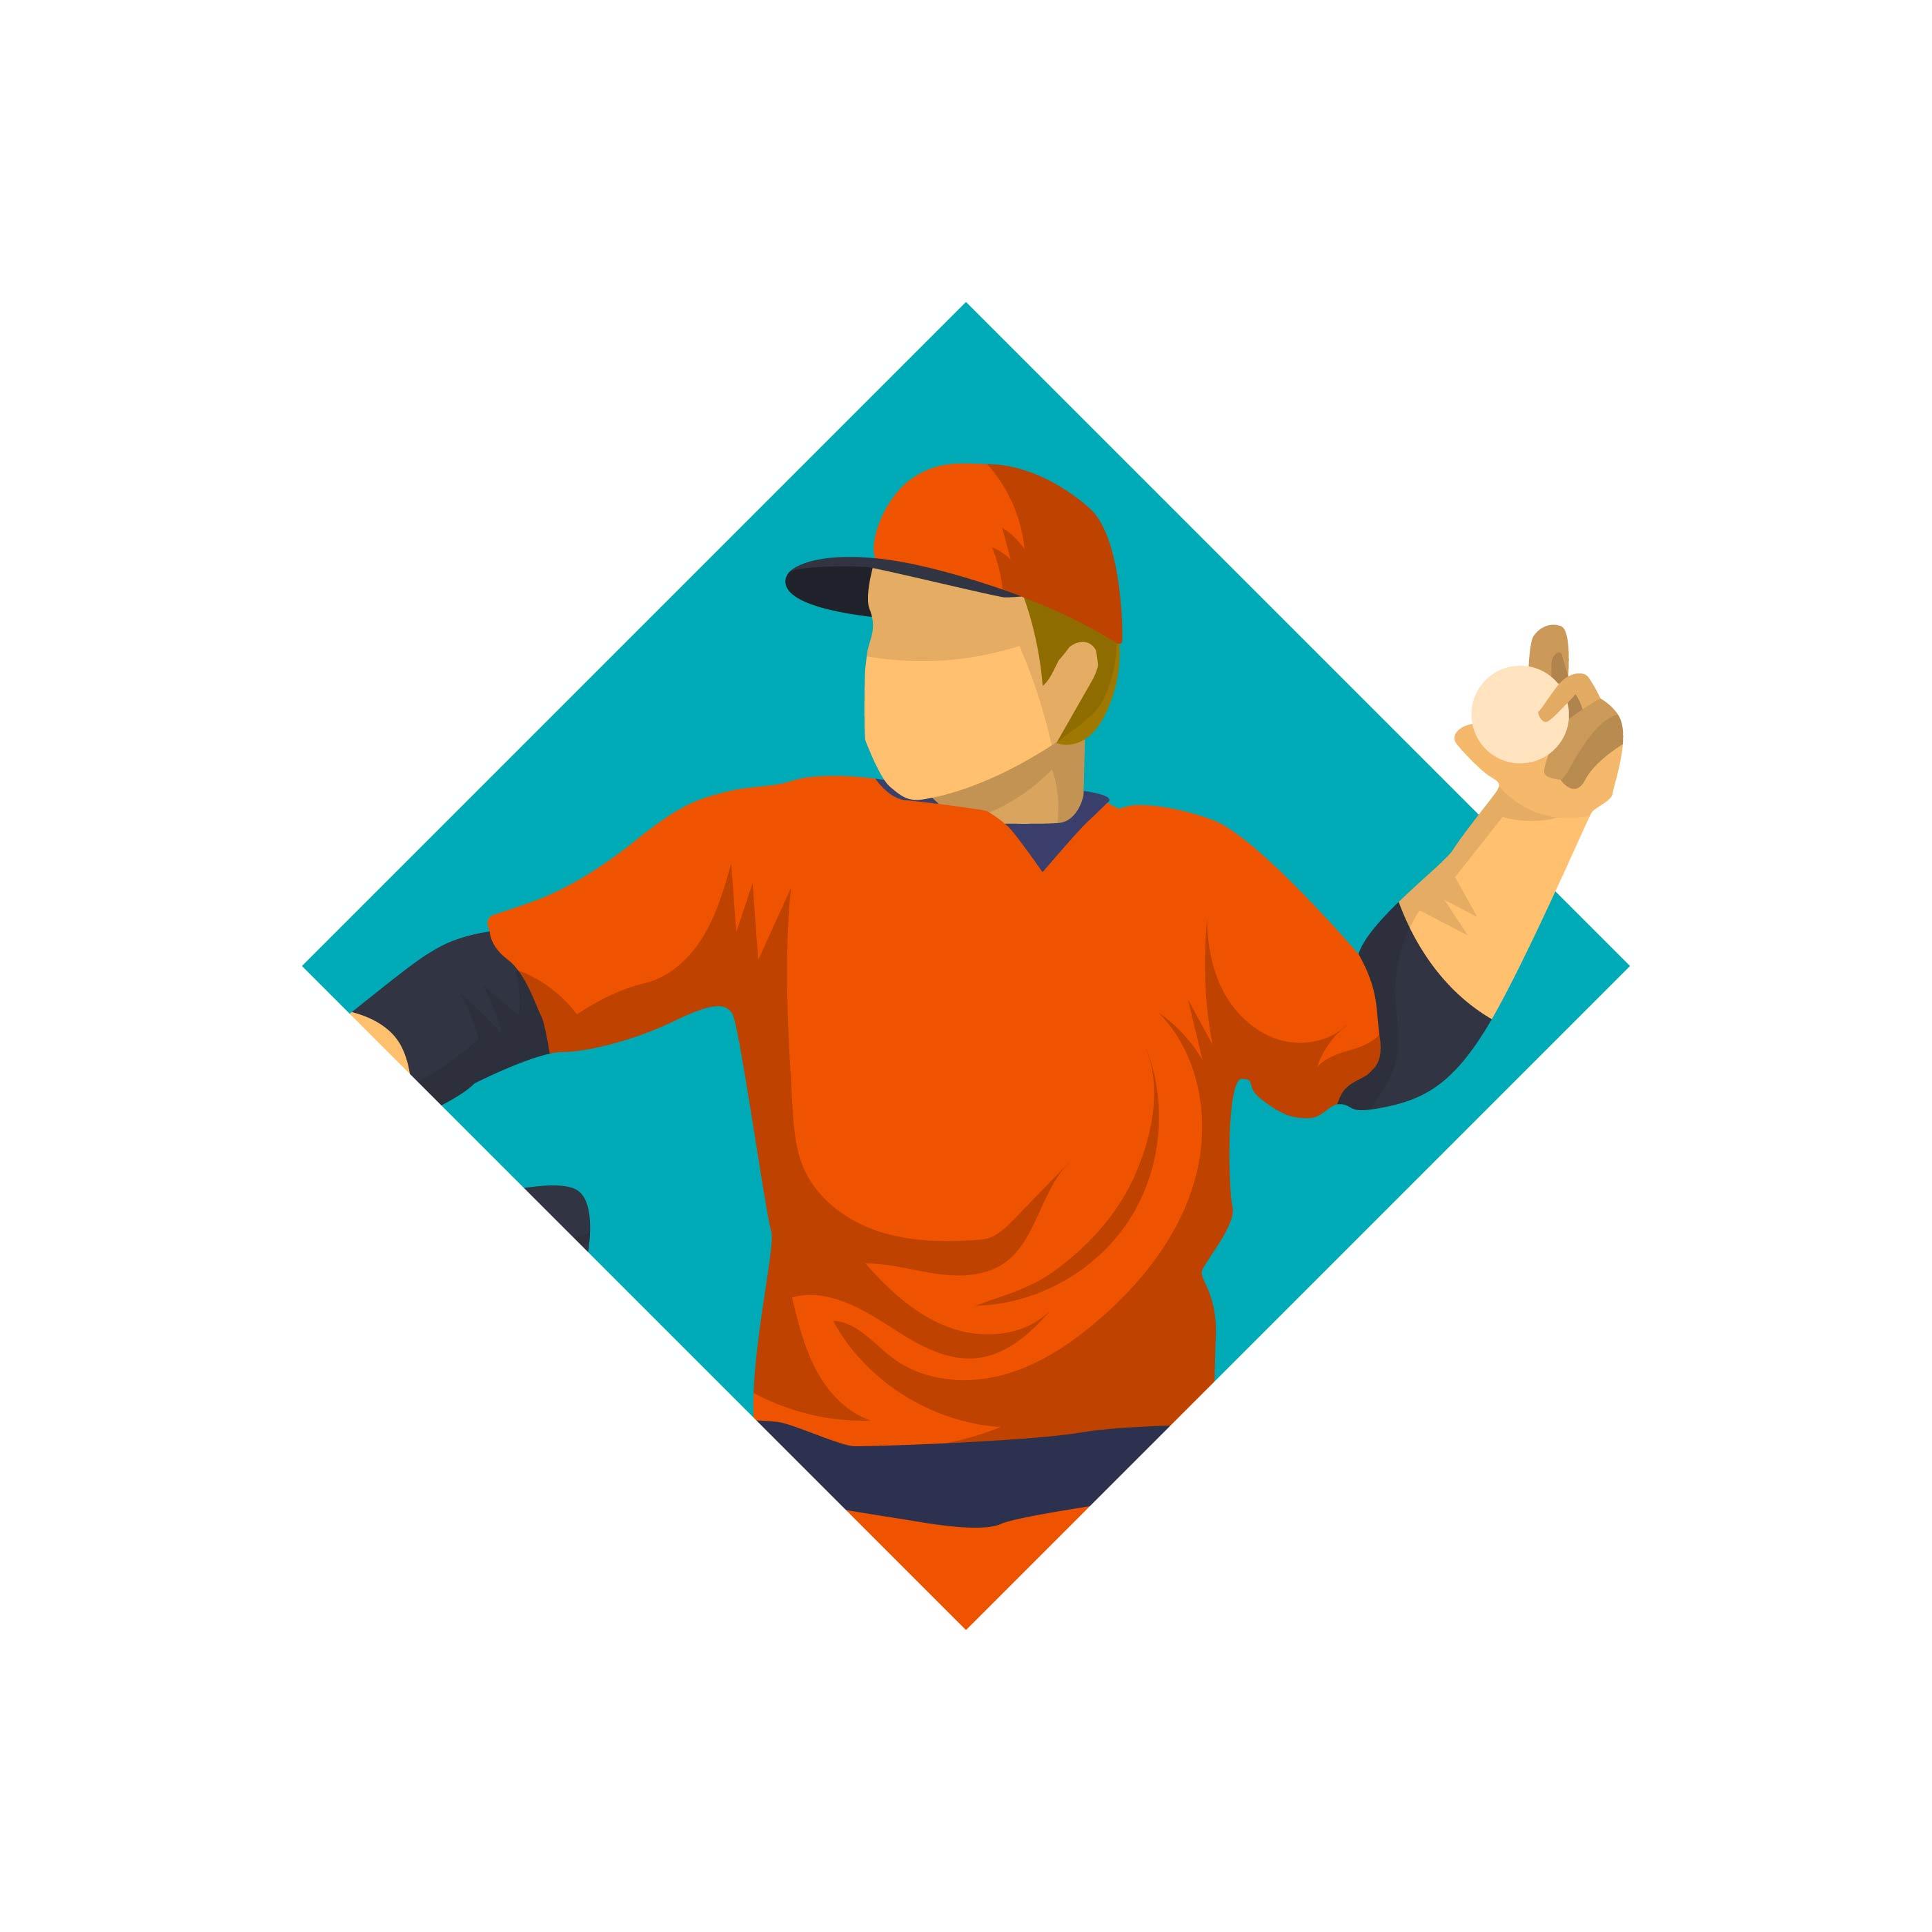 baseball field free vector art 1555 free downloads rh vecteezy com baseball diamond vector free download baseball diamond vector free download